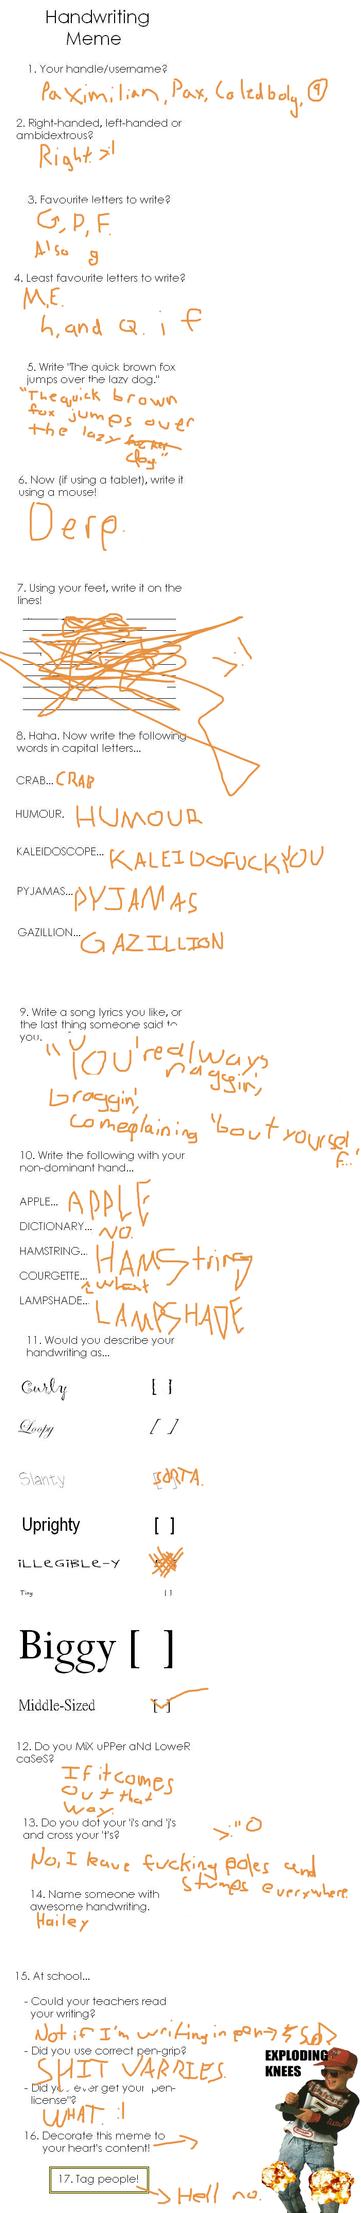 Handwriting Meme. by Sir-Pax